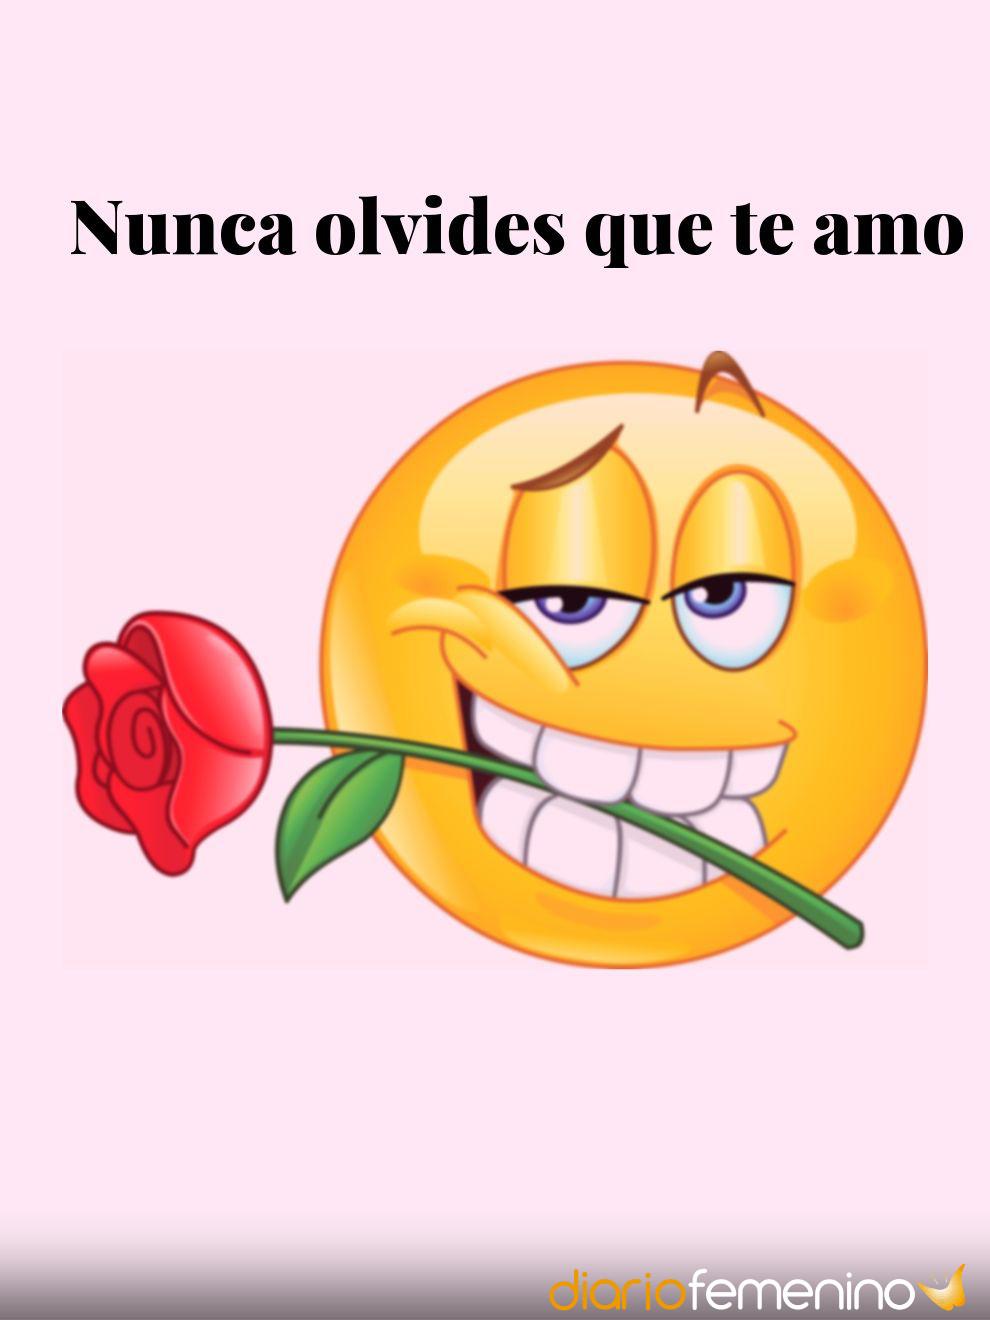 Whatsapp Frases De Amor Con Emoticonos Para Mandar A Tu Novio